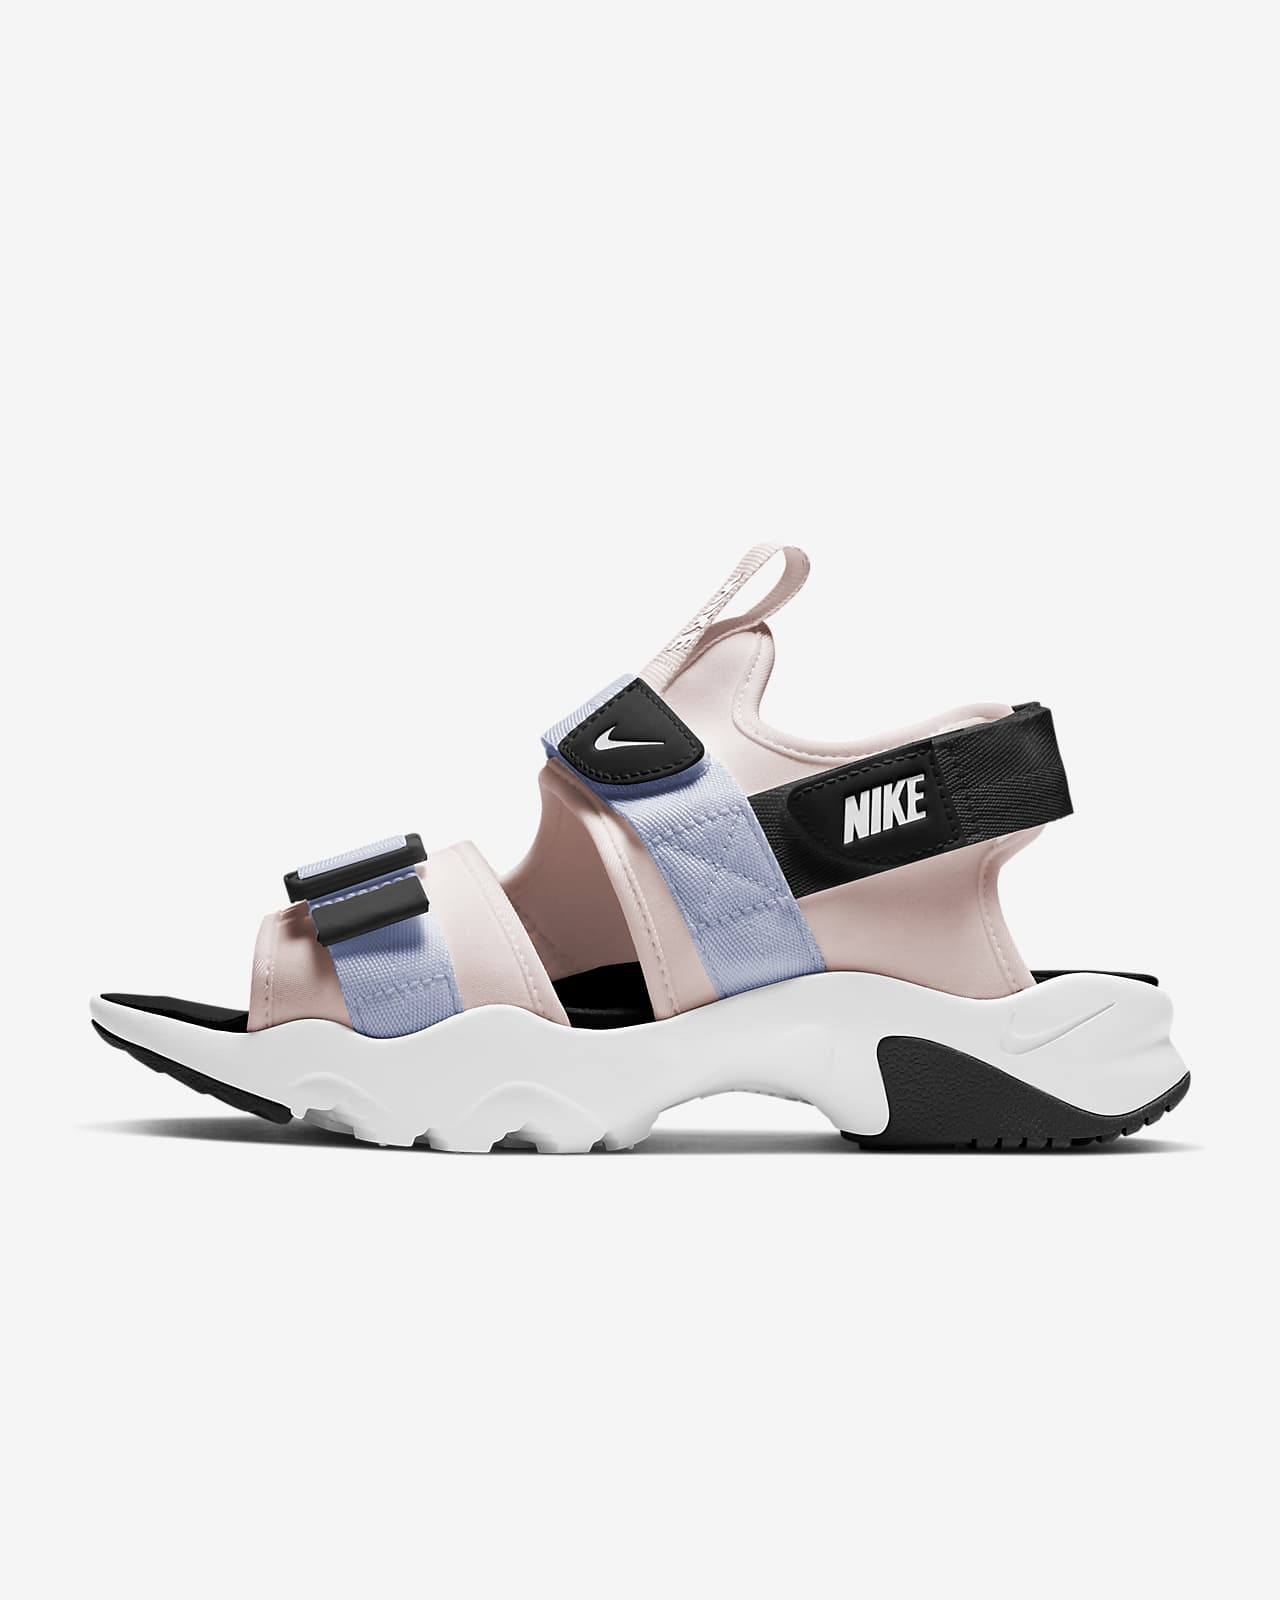 Nike Canyon Sandalias - Mujer